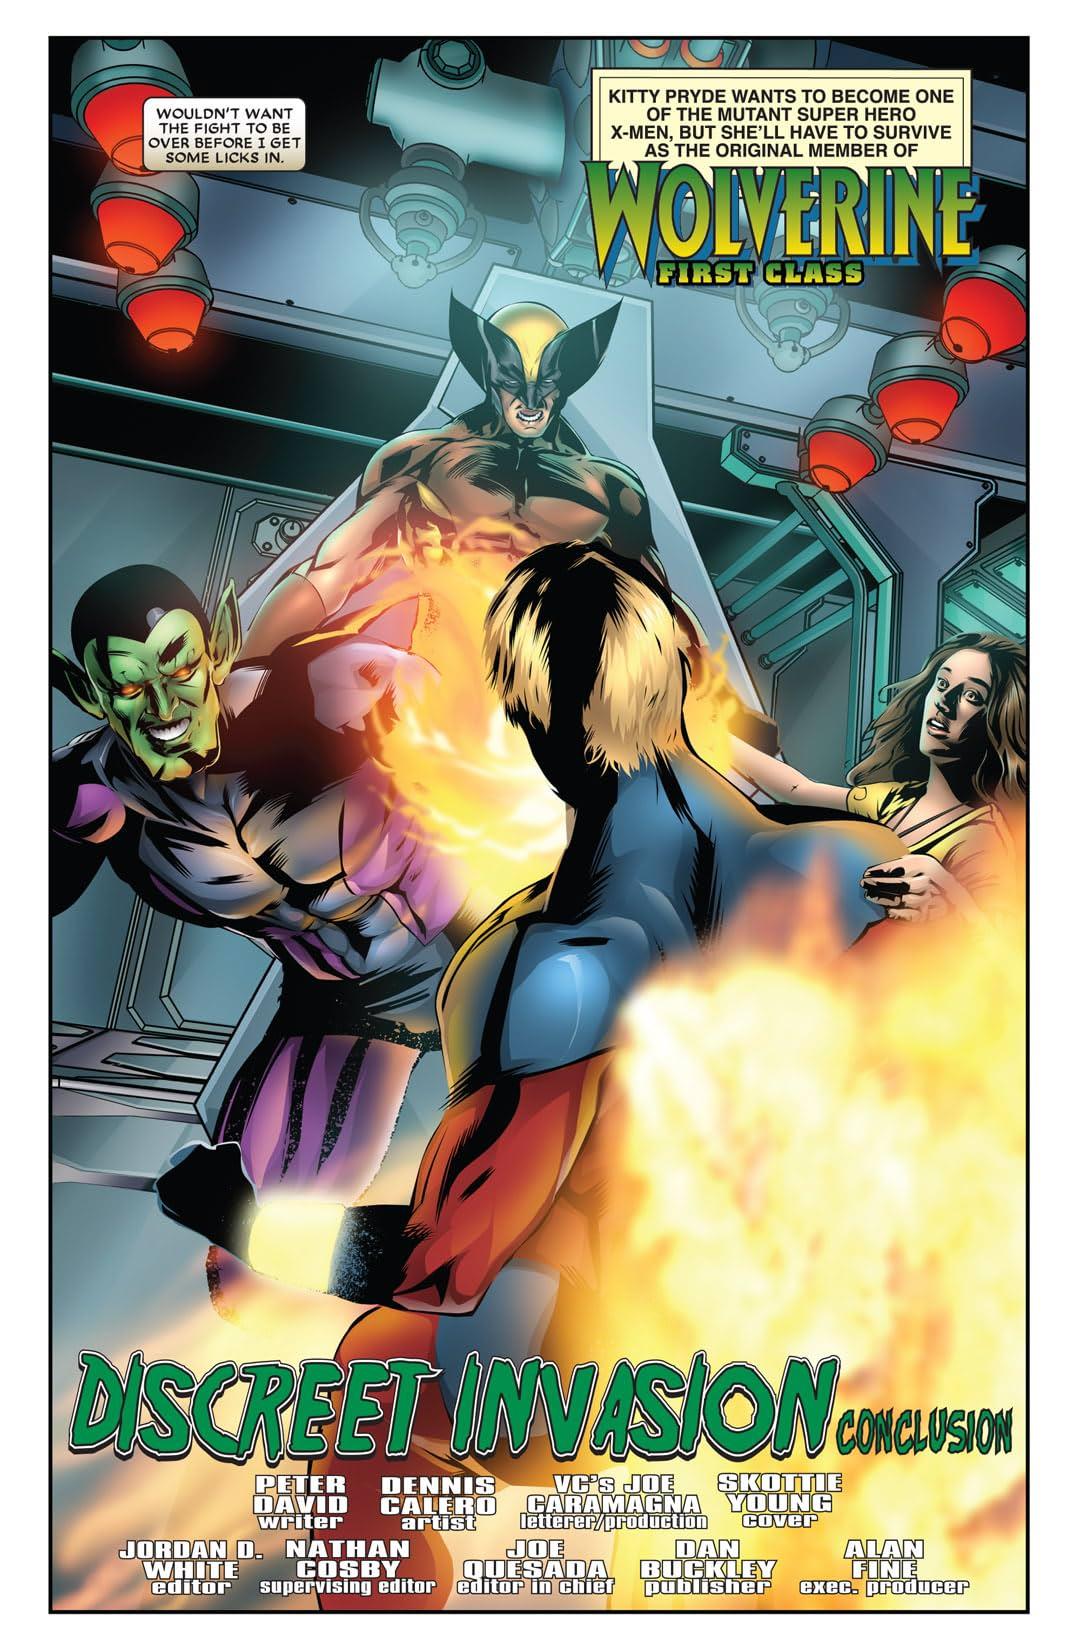 Wolverine: First Class #20